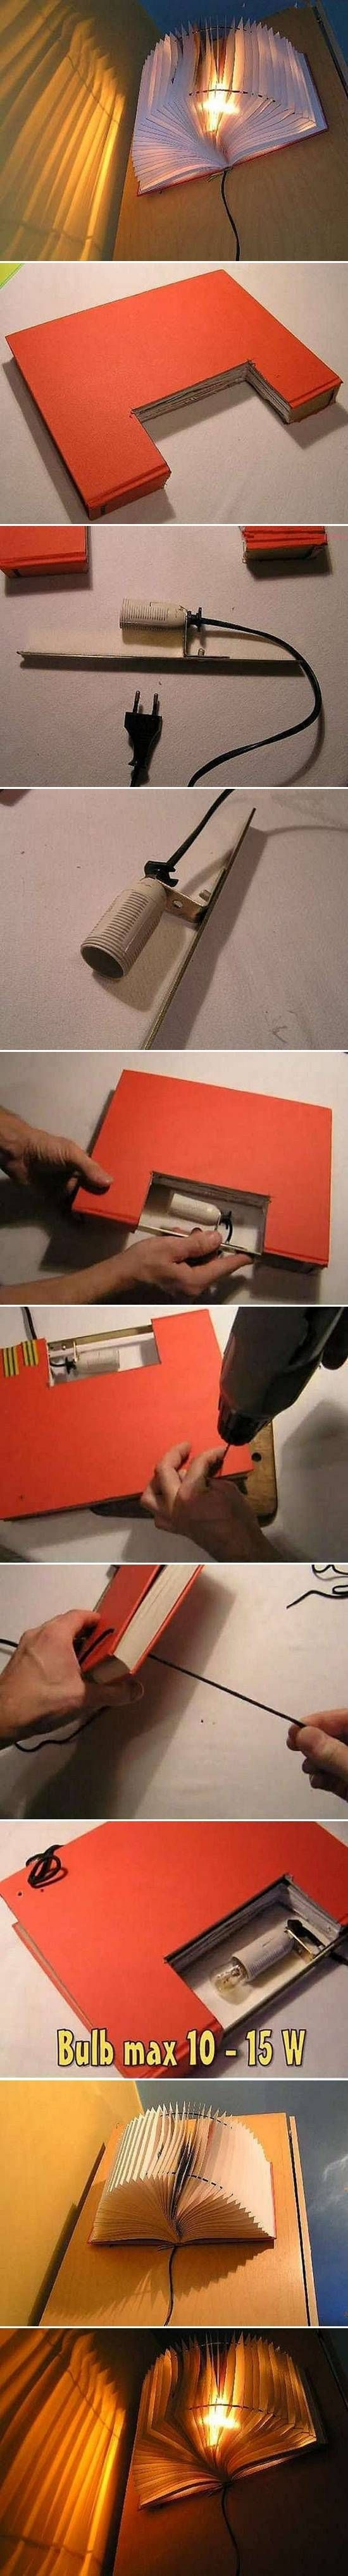 DIY Small Book Light DIY Small Book Light